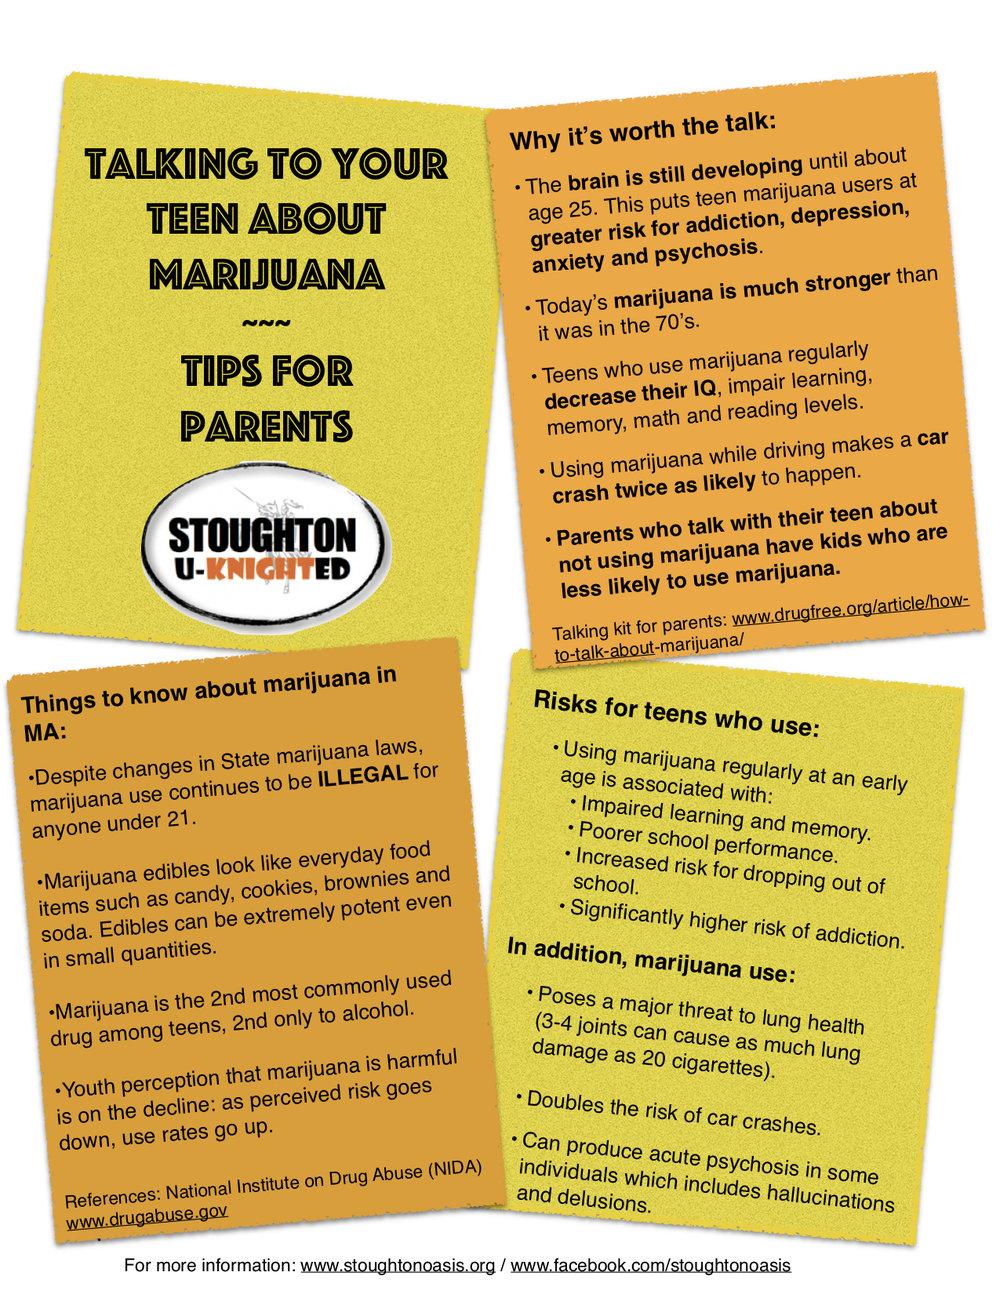 marijuana talking tips for parents.jpg